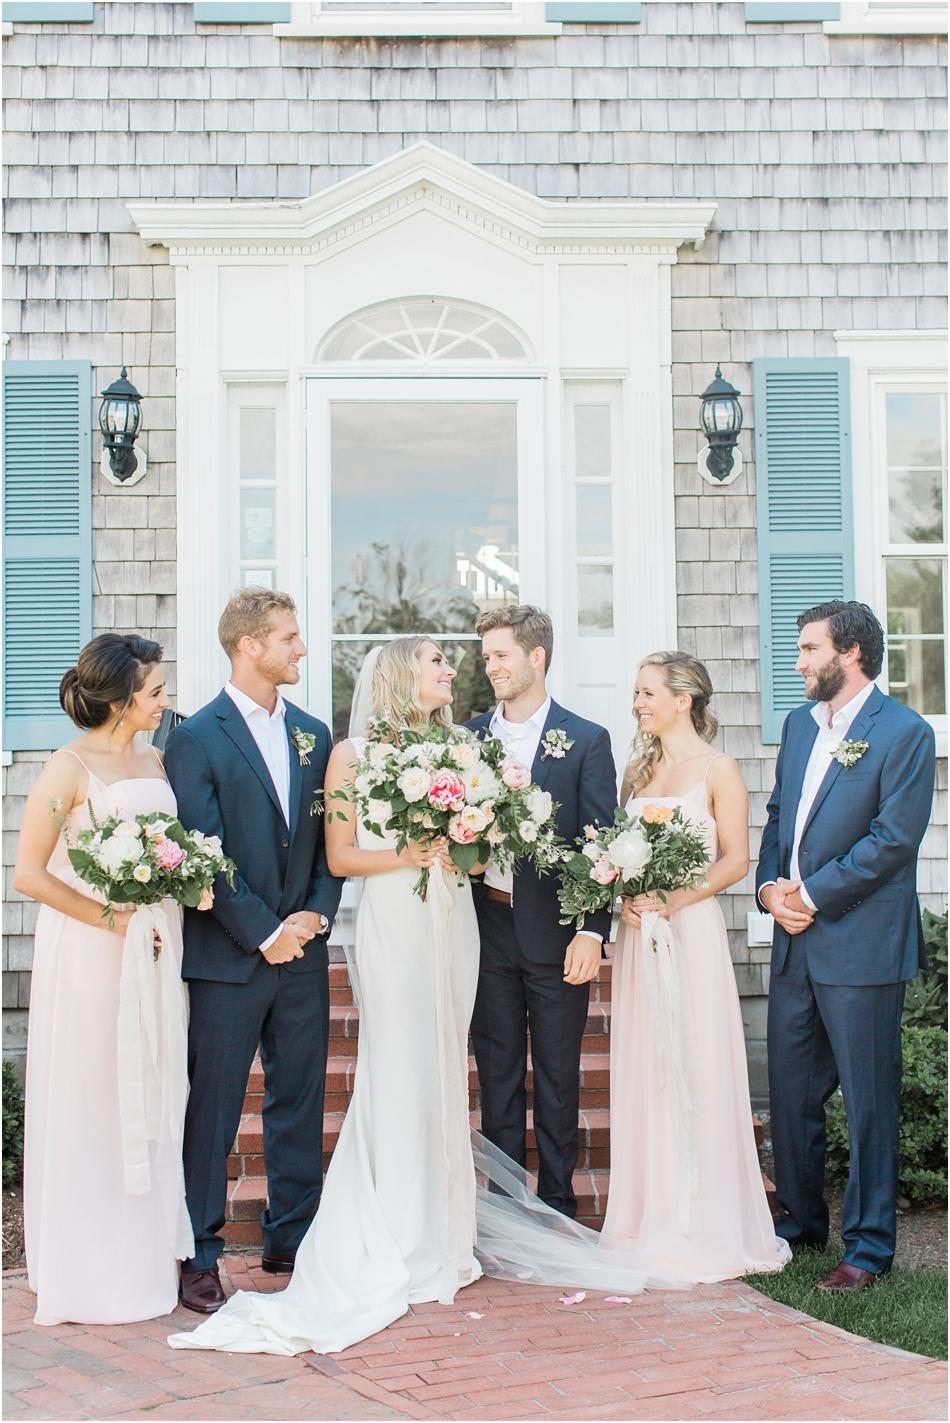 brunch_style_me_pretty_dennis_inn__always_yours_events_wild_dahlia_massachusetts_cape_cod_new_england_wedding_photographer_Meredith_Jane_Photography_photo_2112.jpg